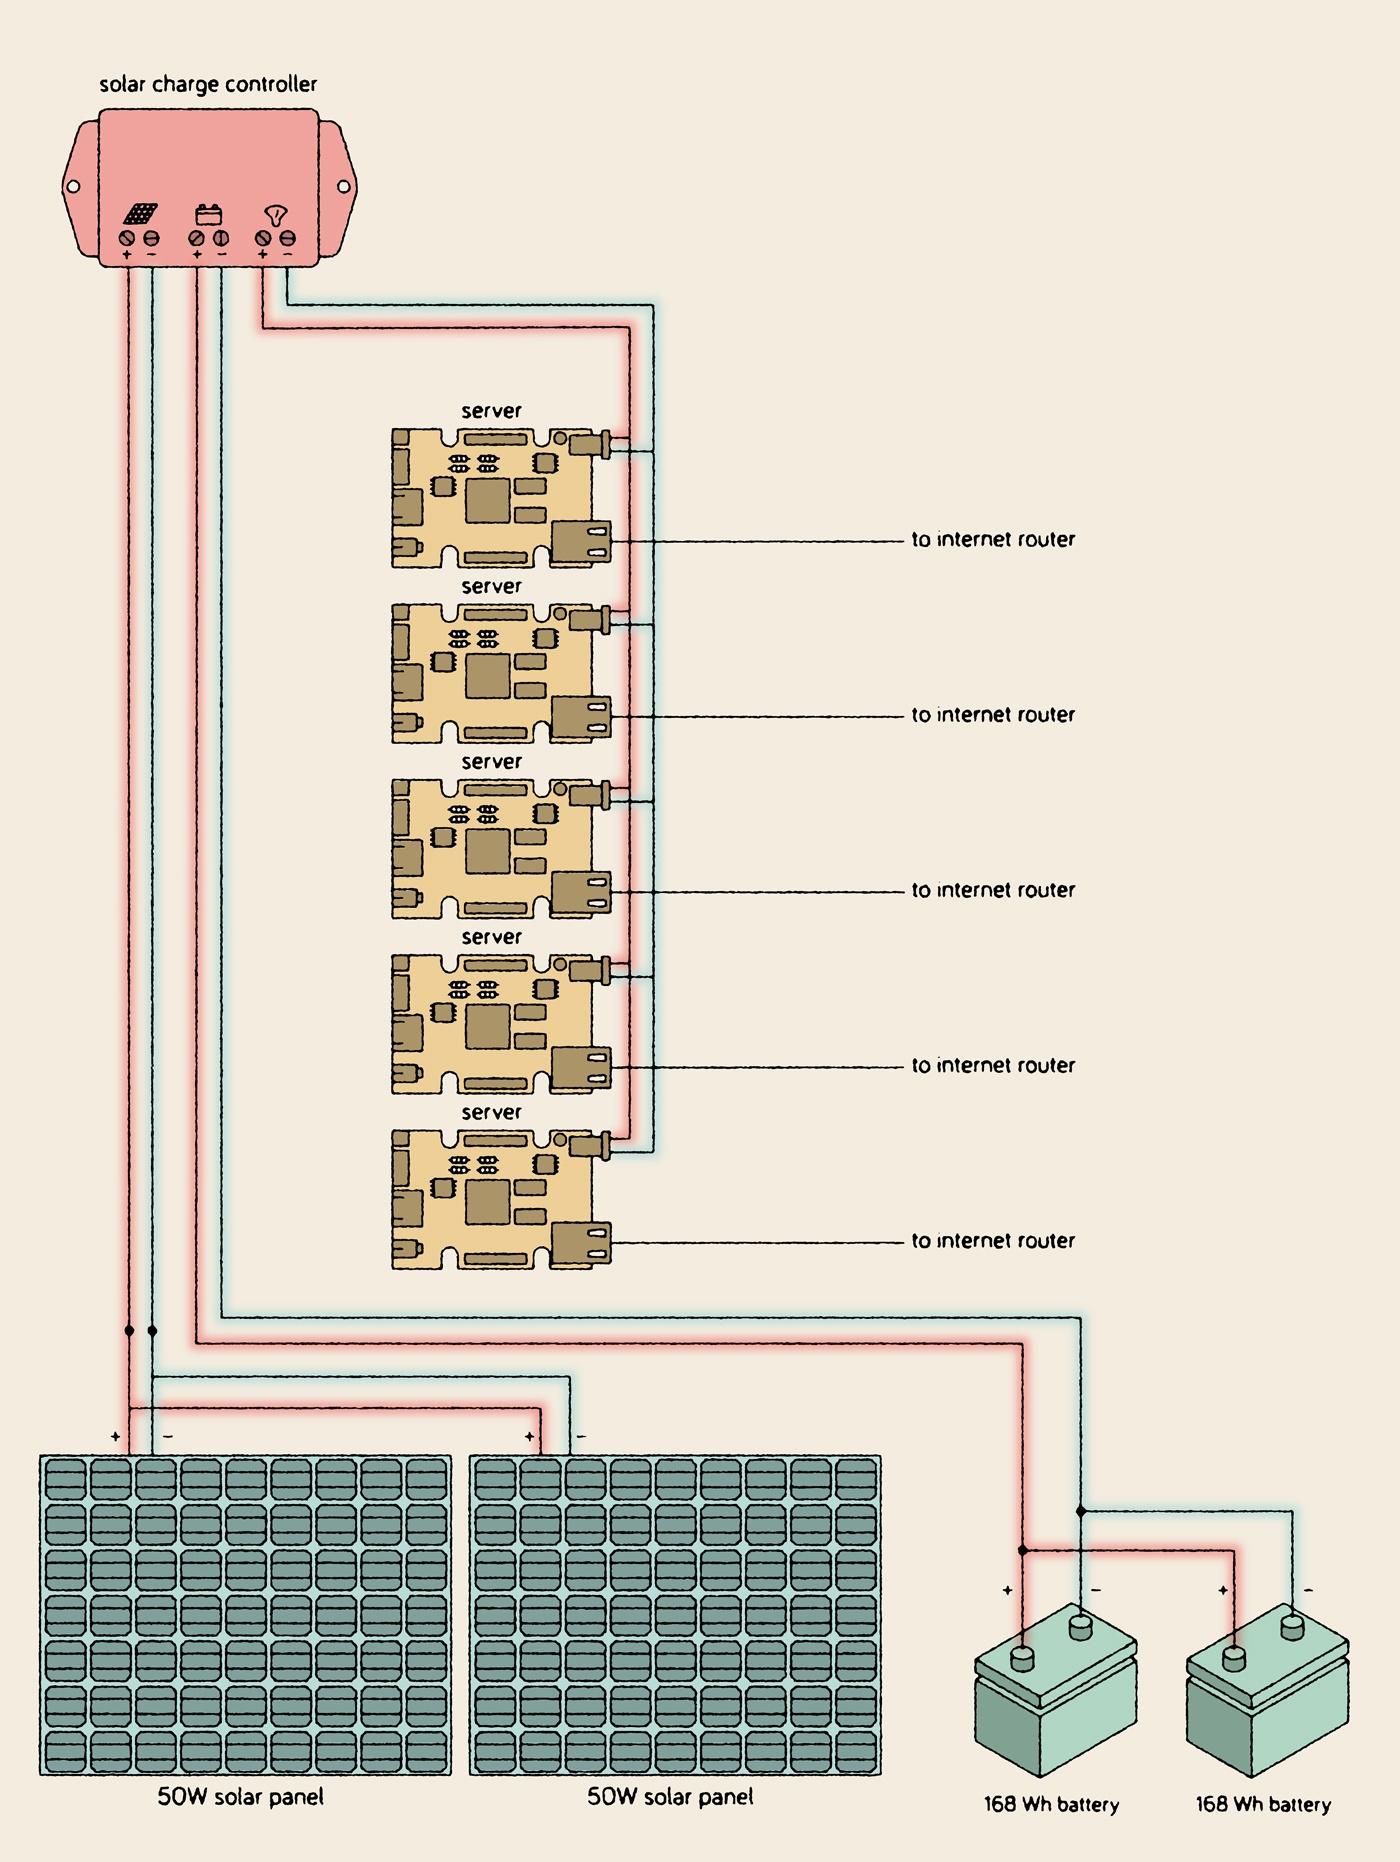 Домашний веб-сервер на солнечных батареях отработал 15 месяцев: аптайм 95,26% - 16